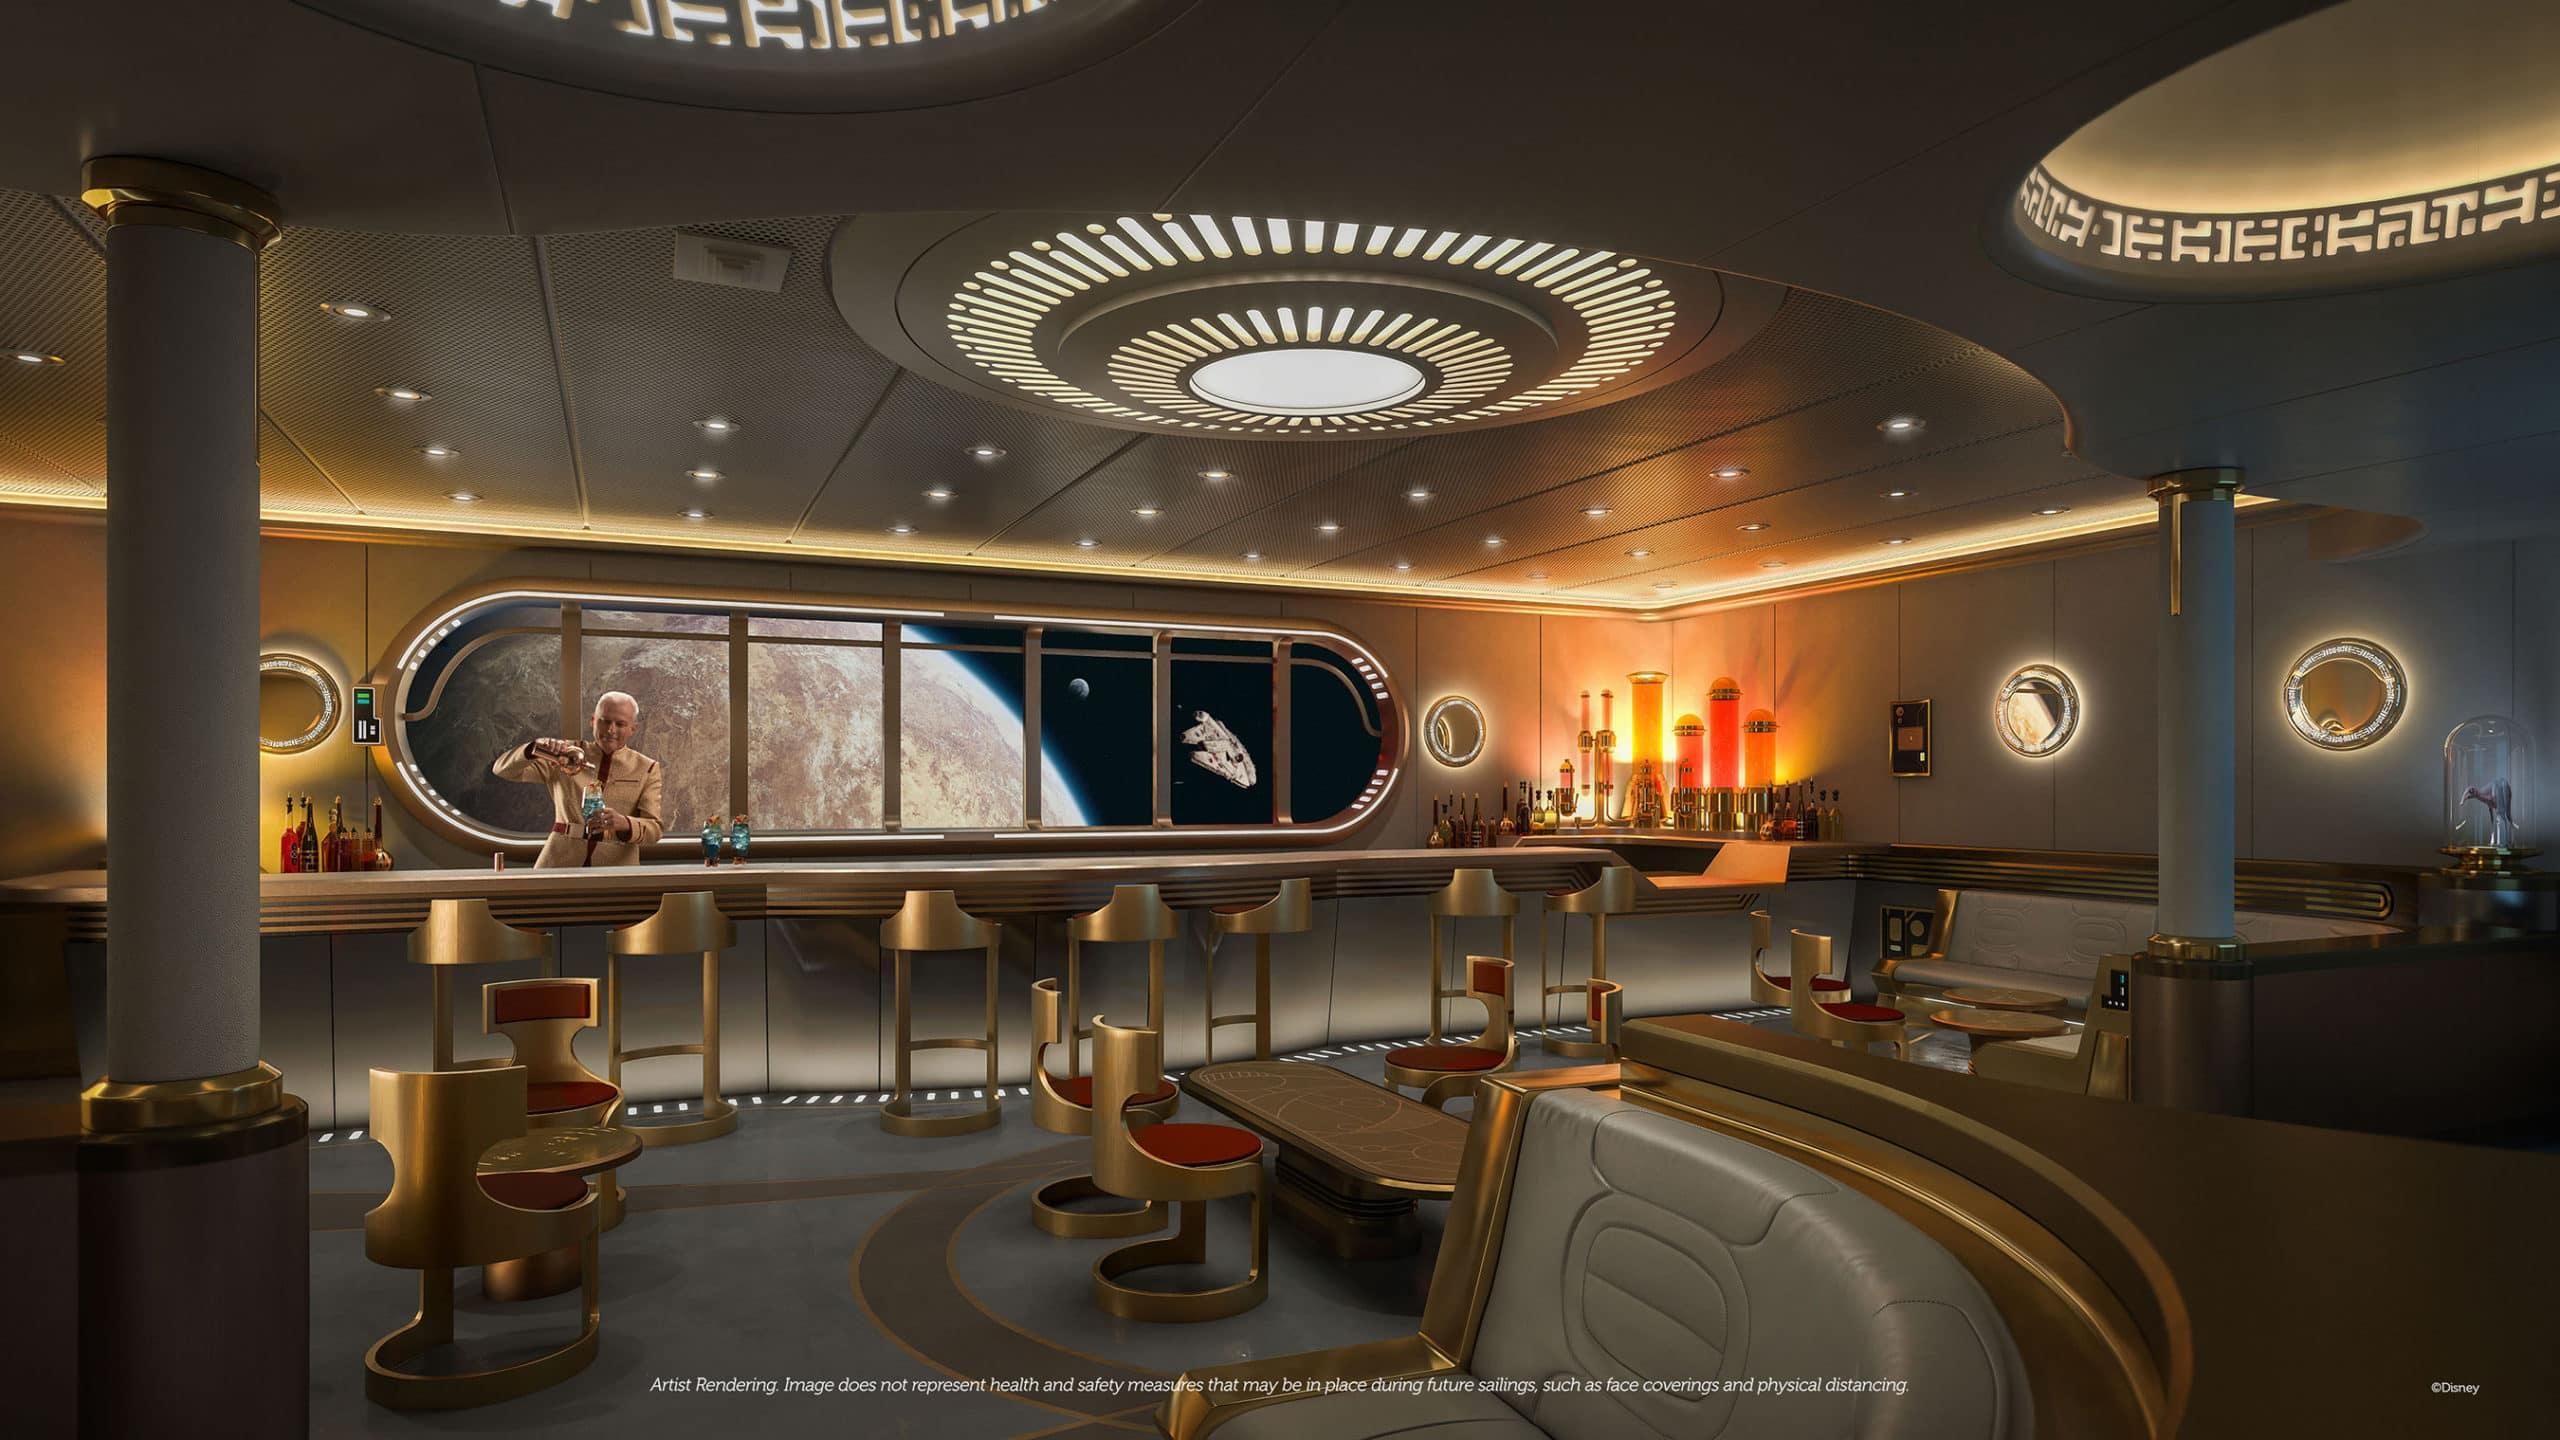 Disney Wish Star Wars lounge